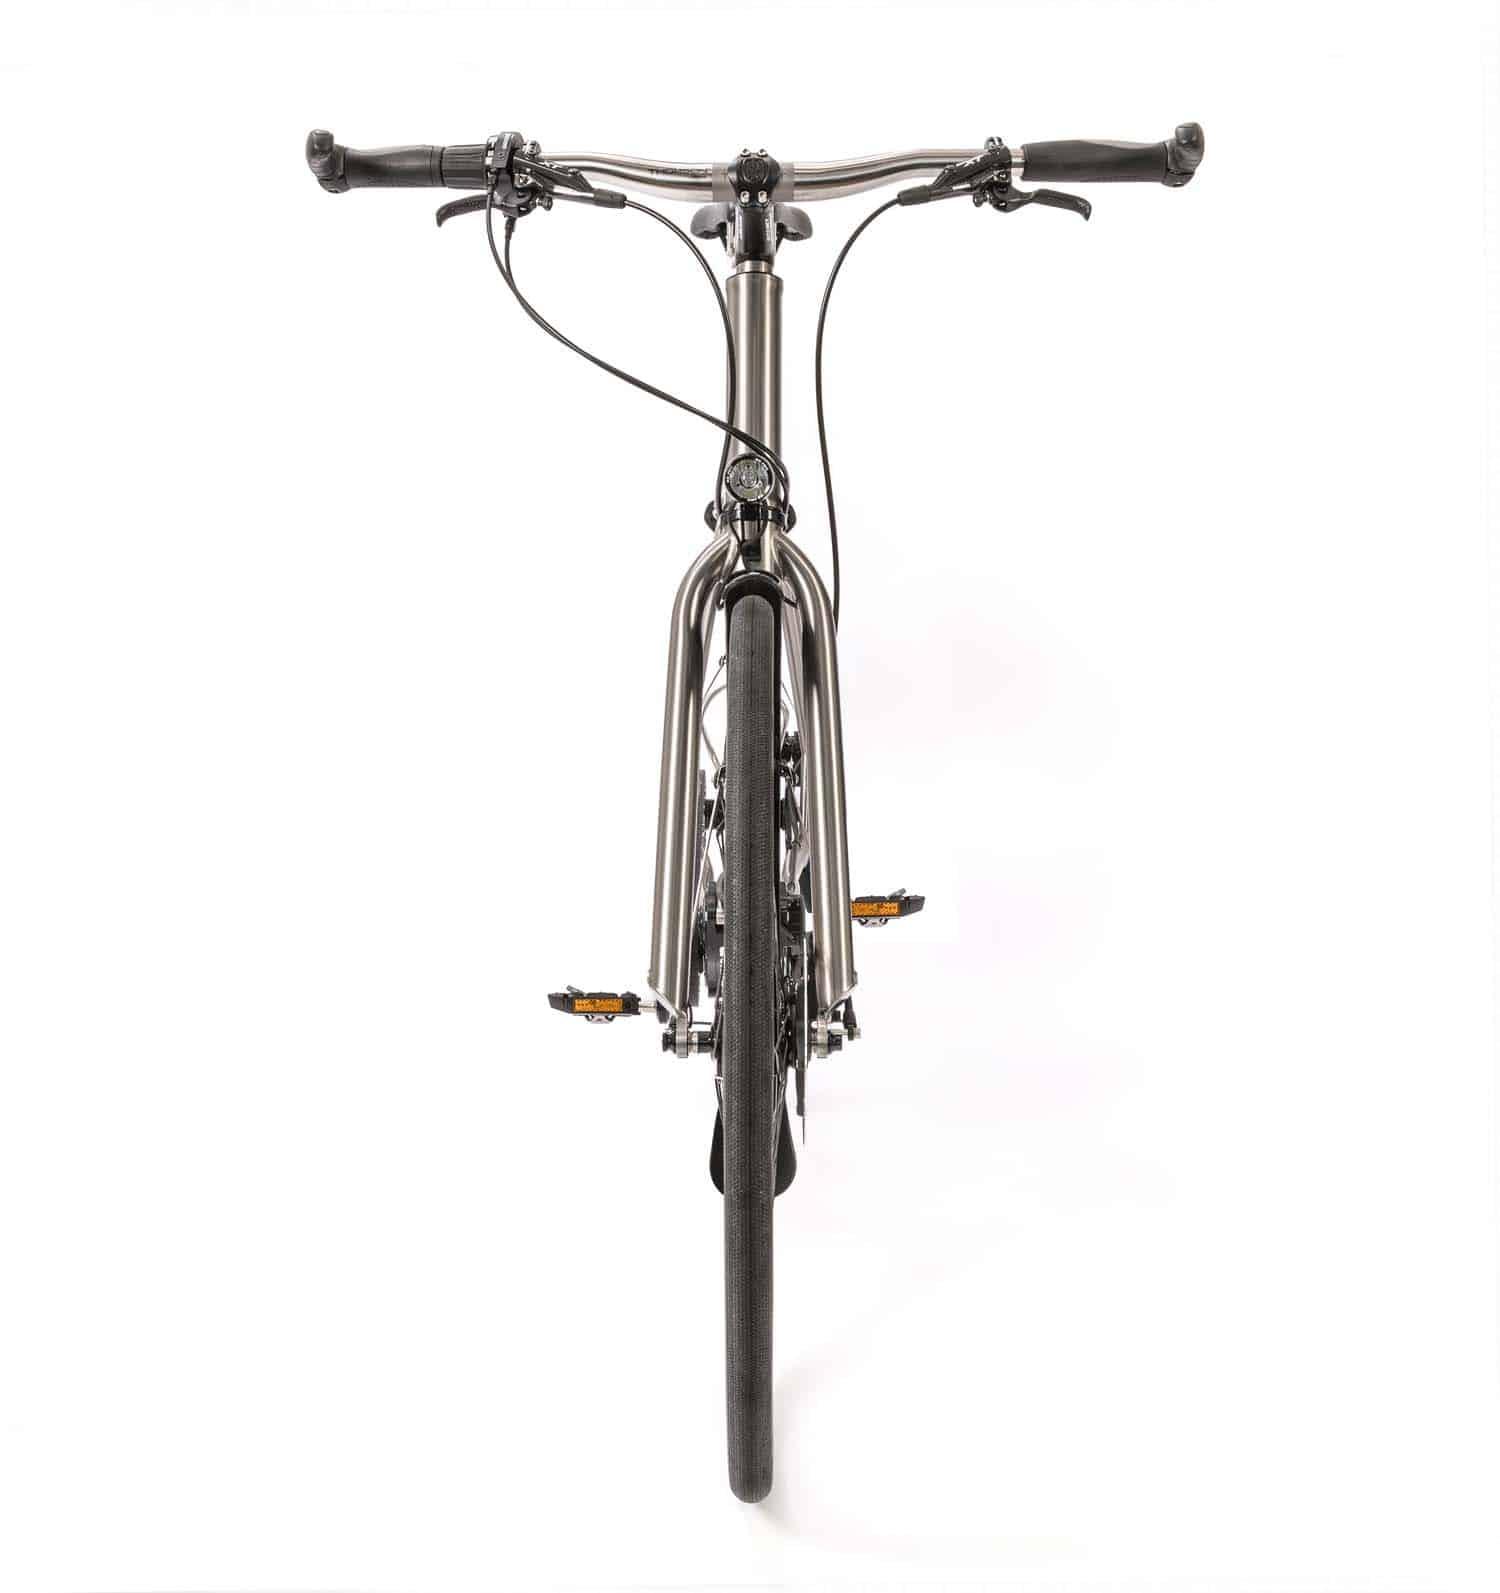 Urban_Pinion_Bike_03_min